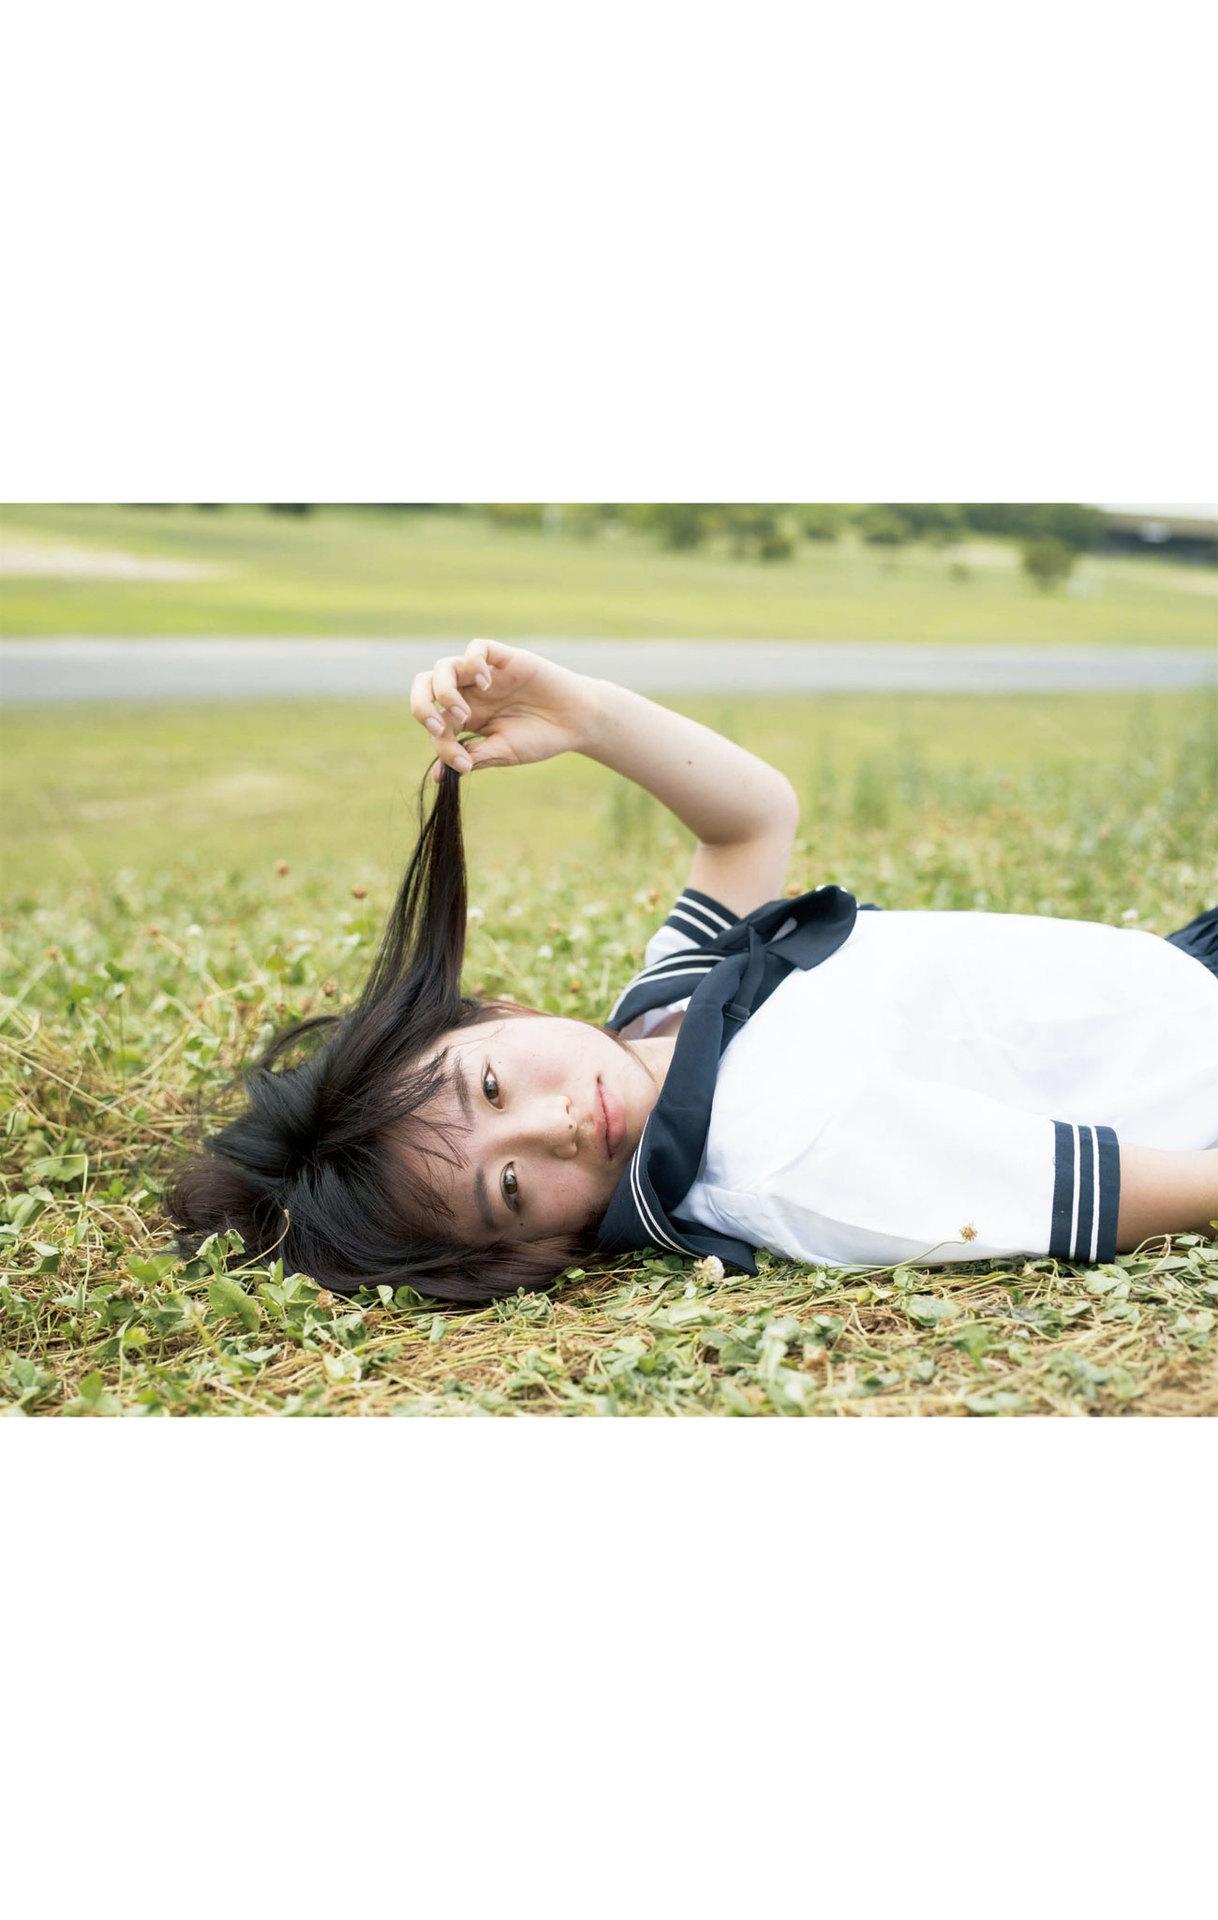 Summer Vacation Uniform After School Youth Bikini047